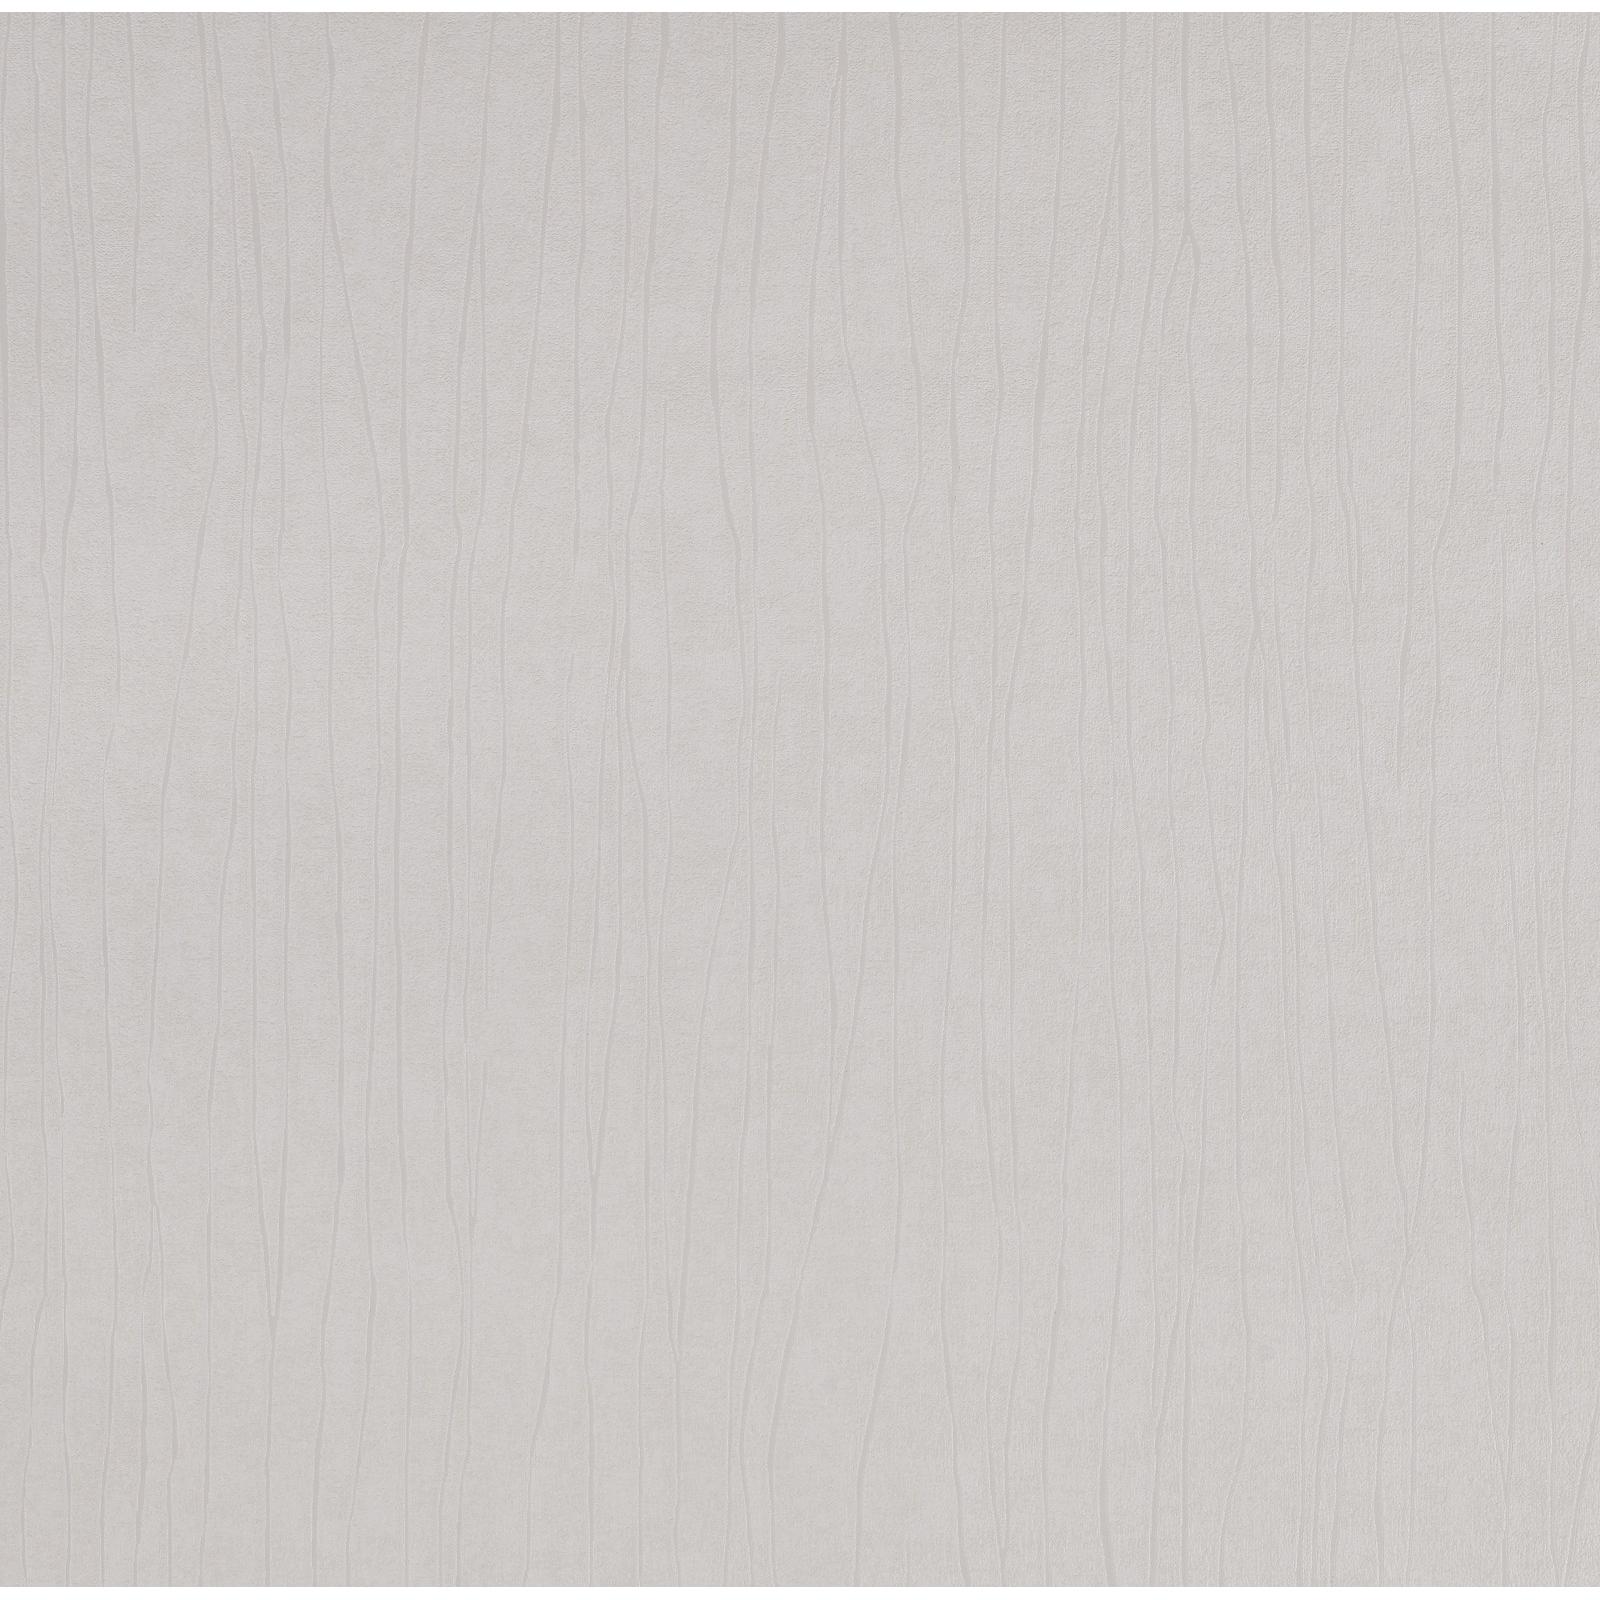 Superfresco Easy White Spun Silk Wallpaper - White Spun Silk Sample